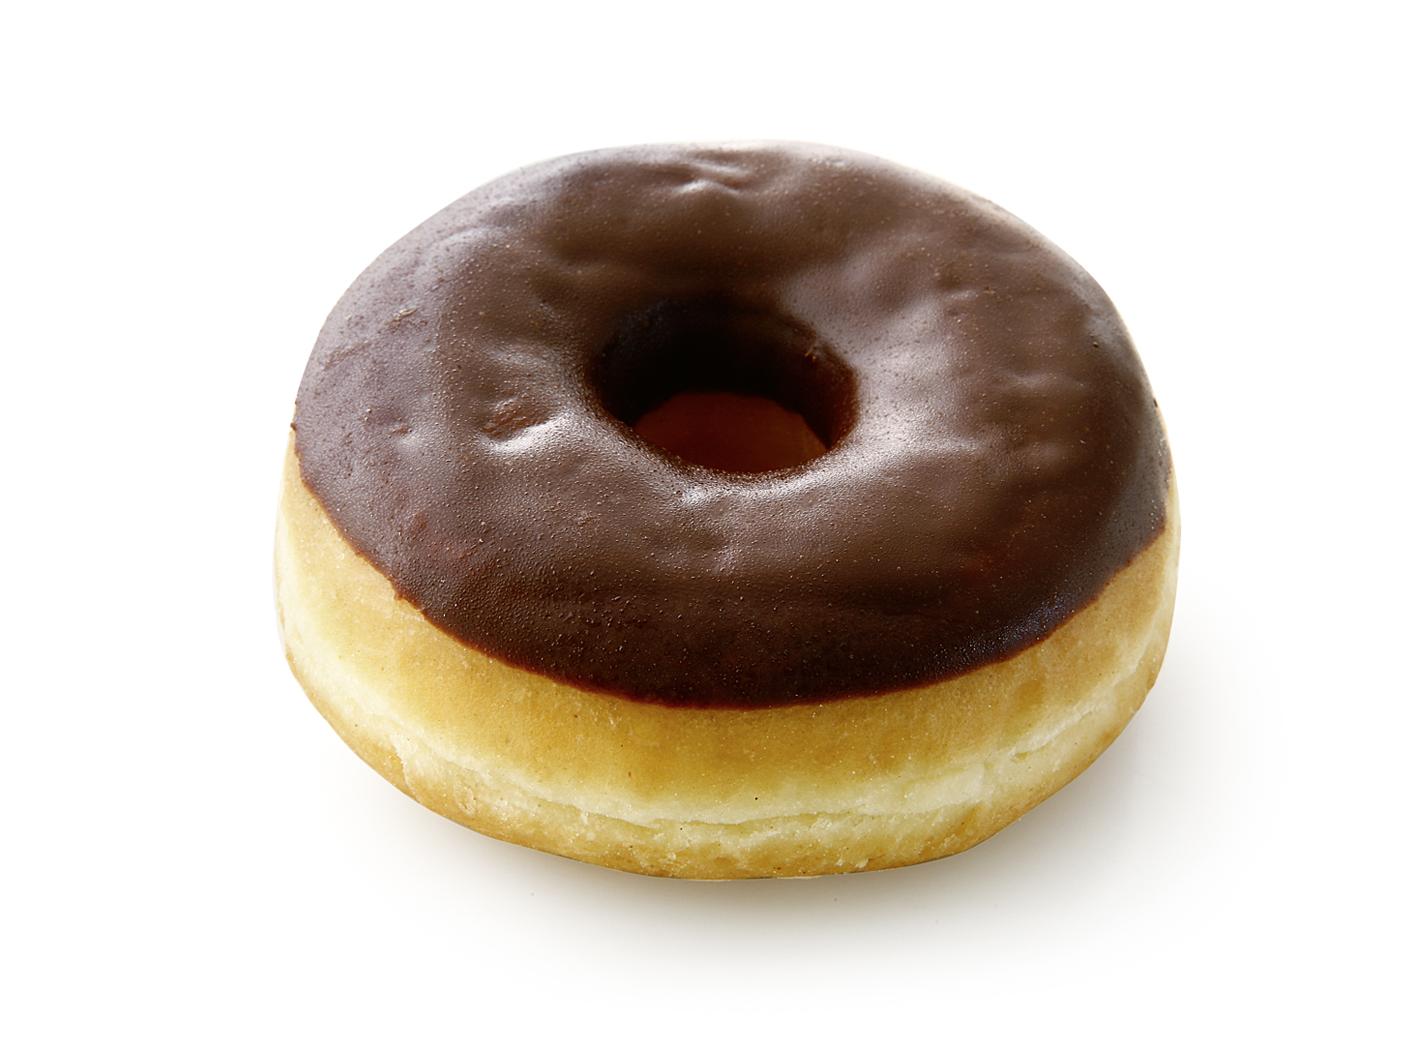 Donut half coated with chocolate - Fried yeast dough half covered with chocolate coating/ thaw only/ diameter: 9 cm